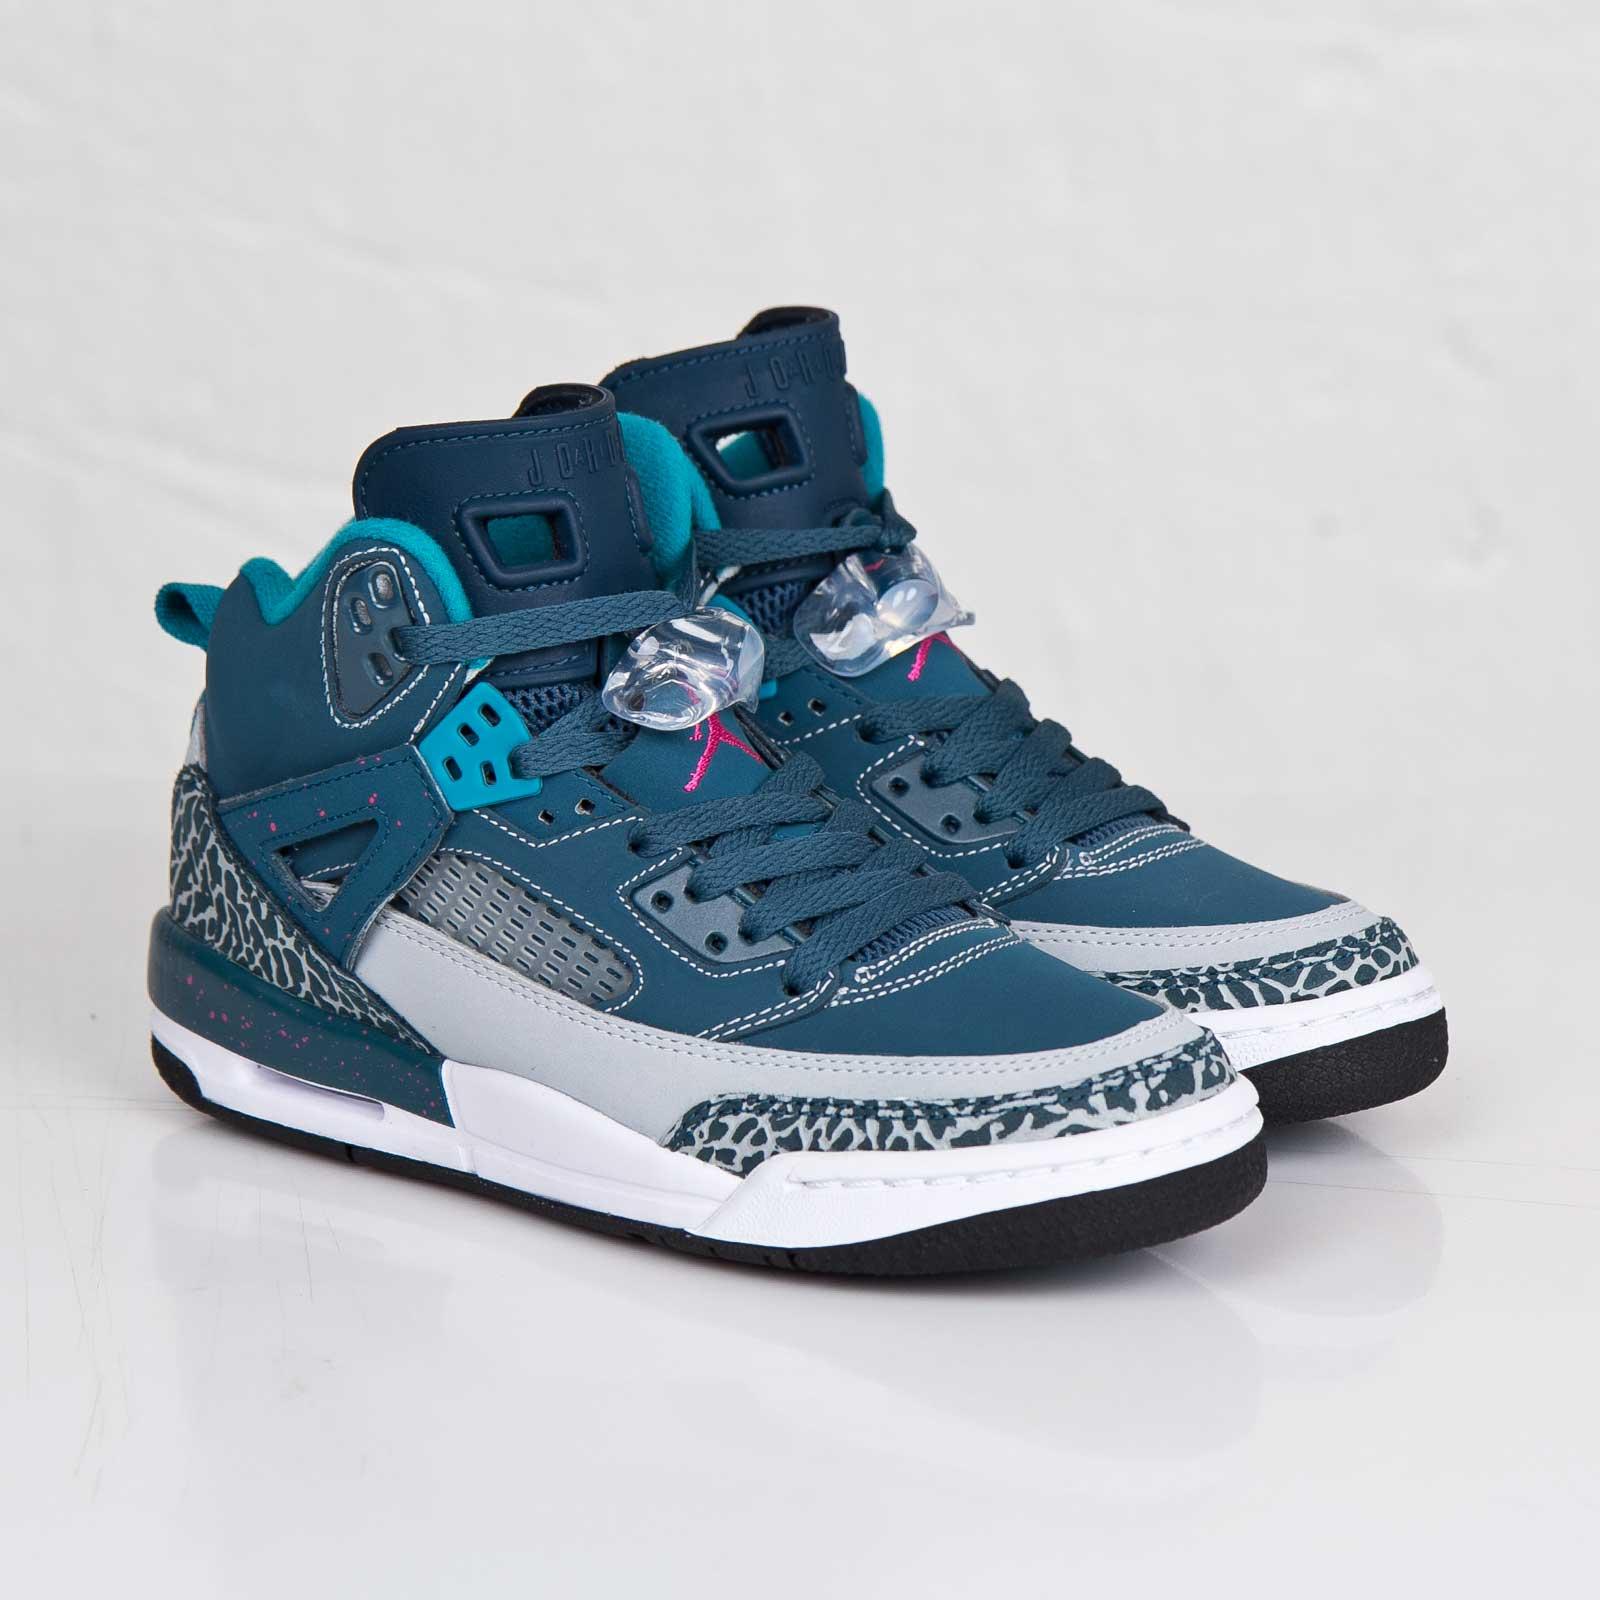 finest selection 92764 f6664 Jordan Brand Jordan Spizike (GS)